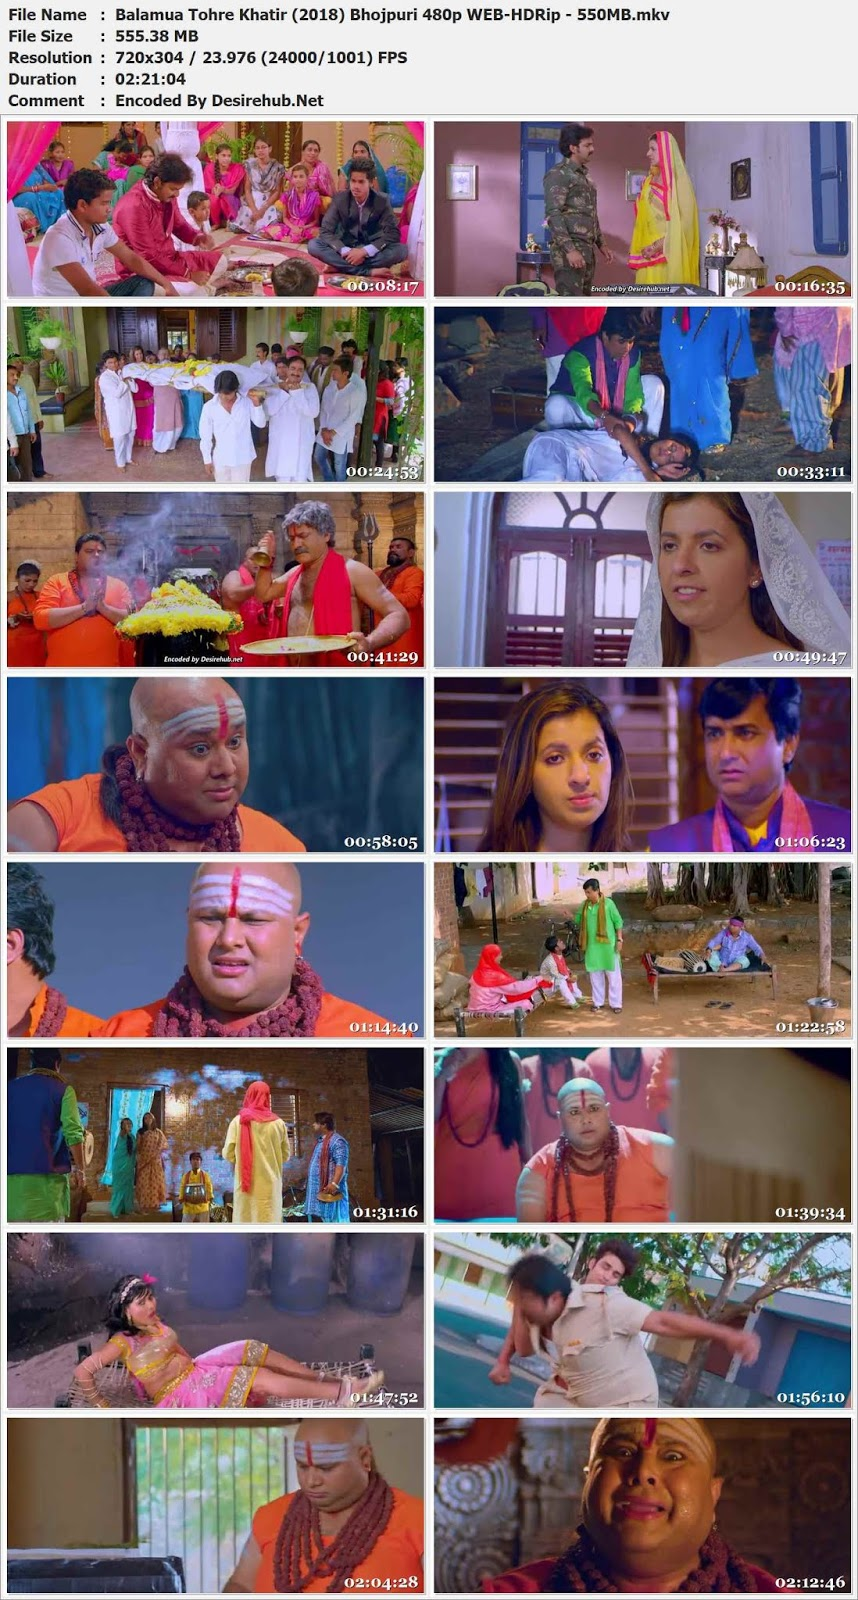 Balamua Tohre Khatir (2018) Bhojpuri 480p WEB-HDRip – 550MB Desirehub